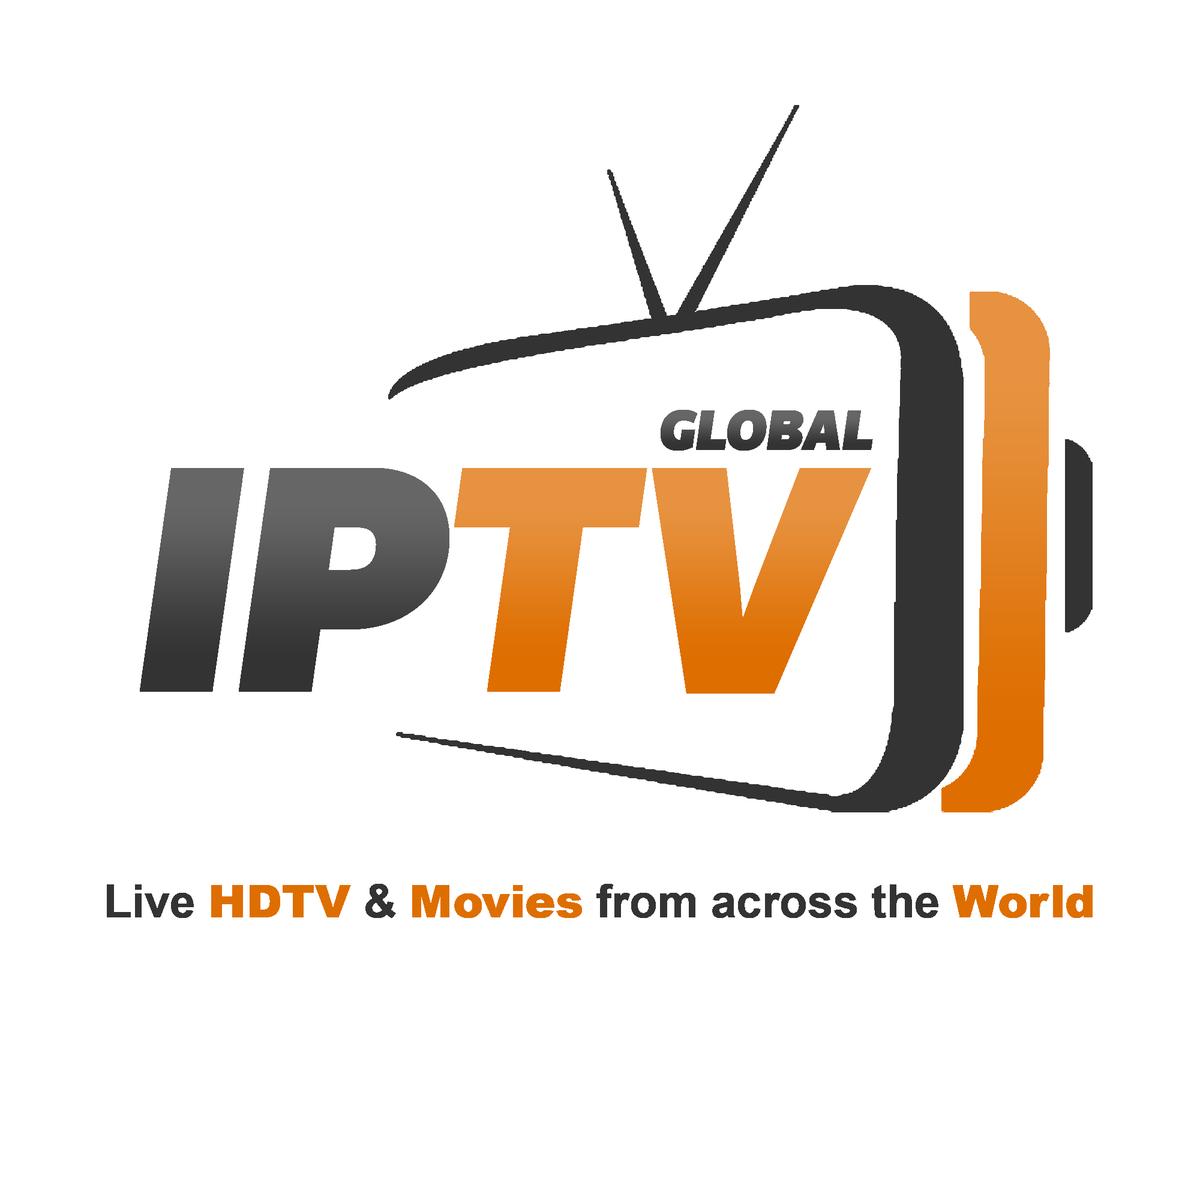 Global-IPTV (@mikebissel1517) | Twitter